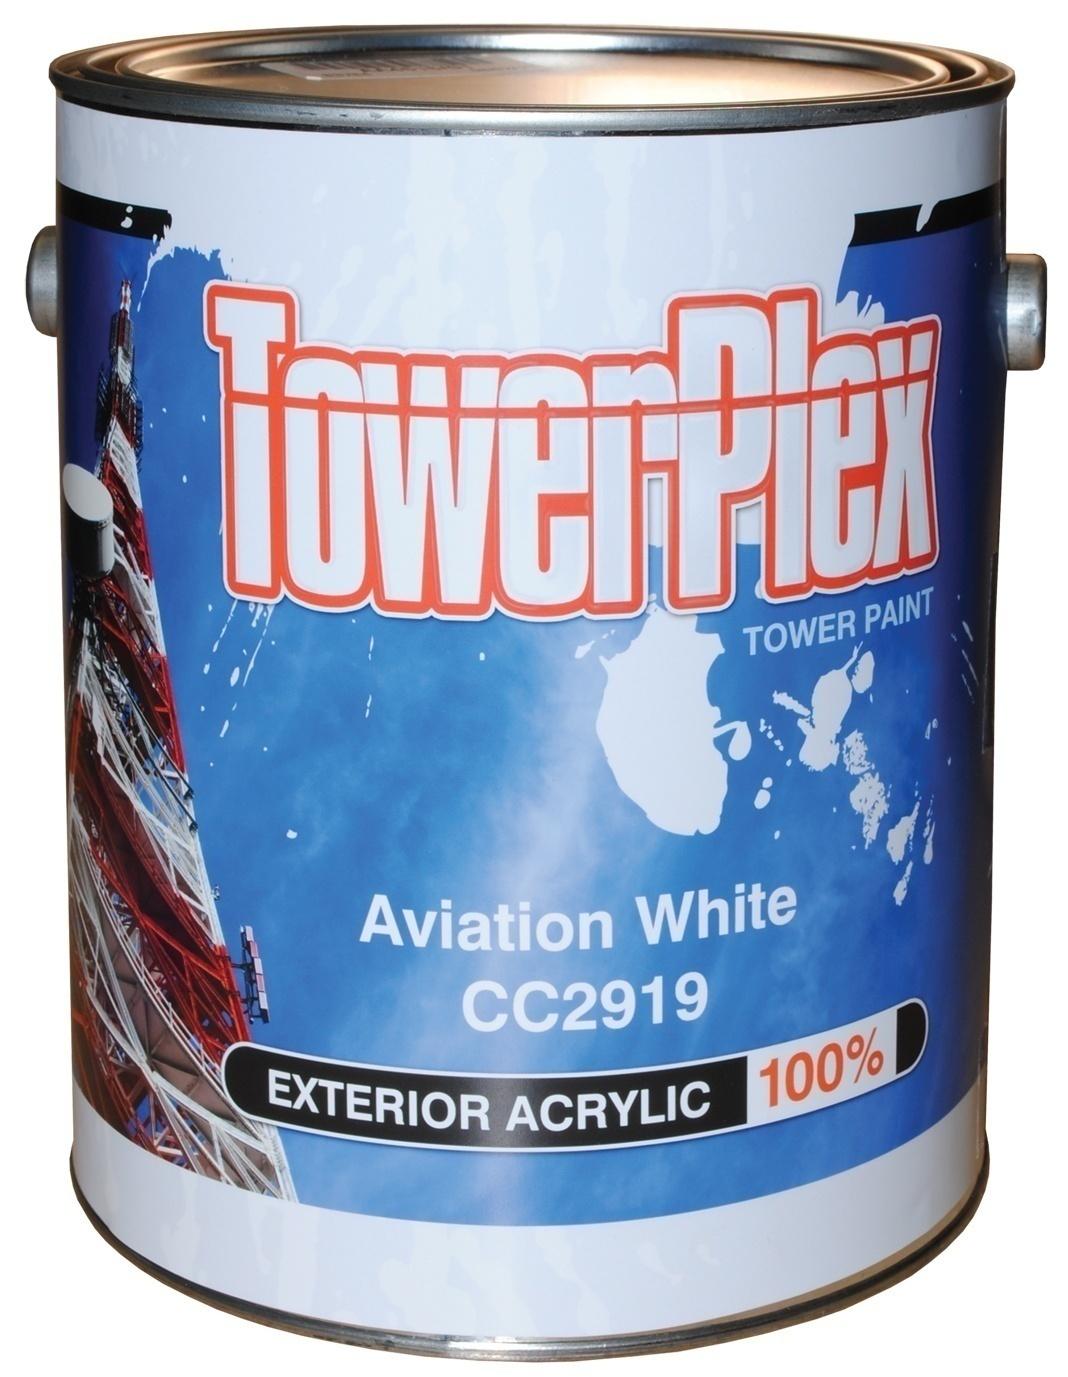 CC2919 TowerPlex Aviation White Tower Paint